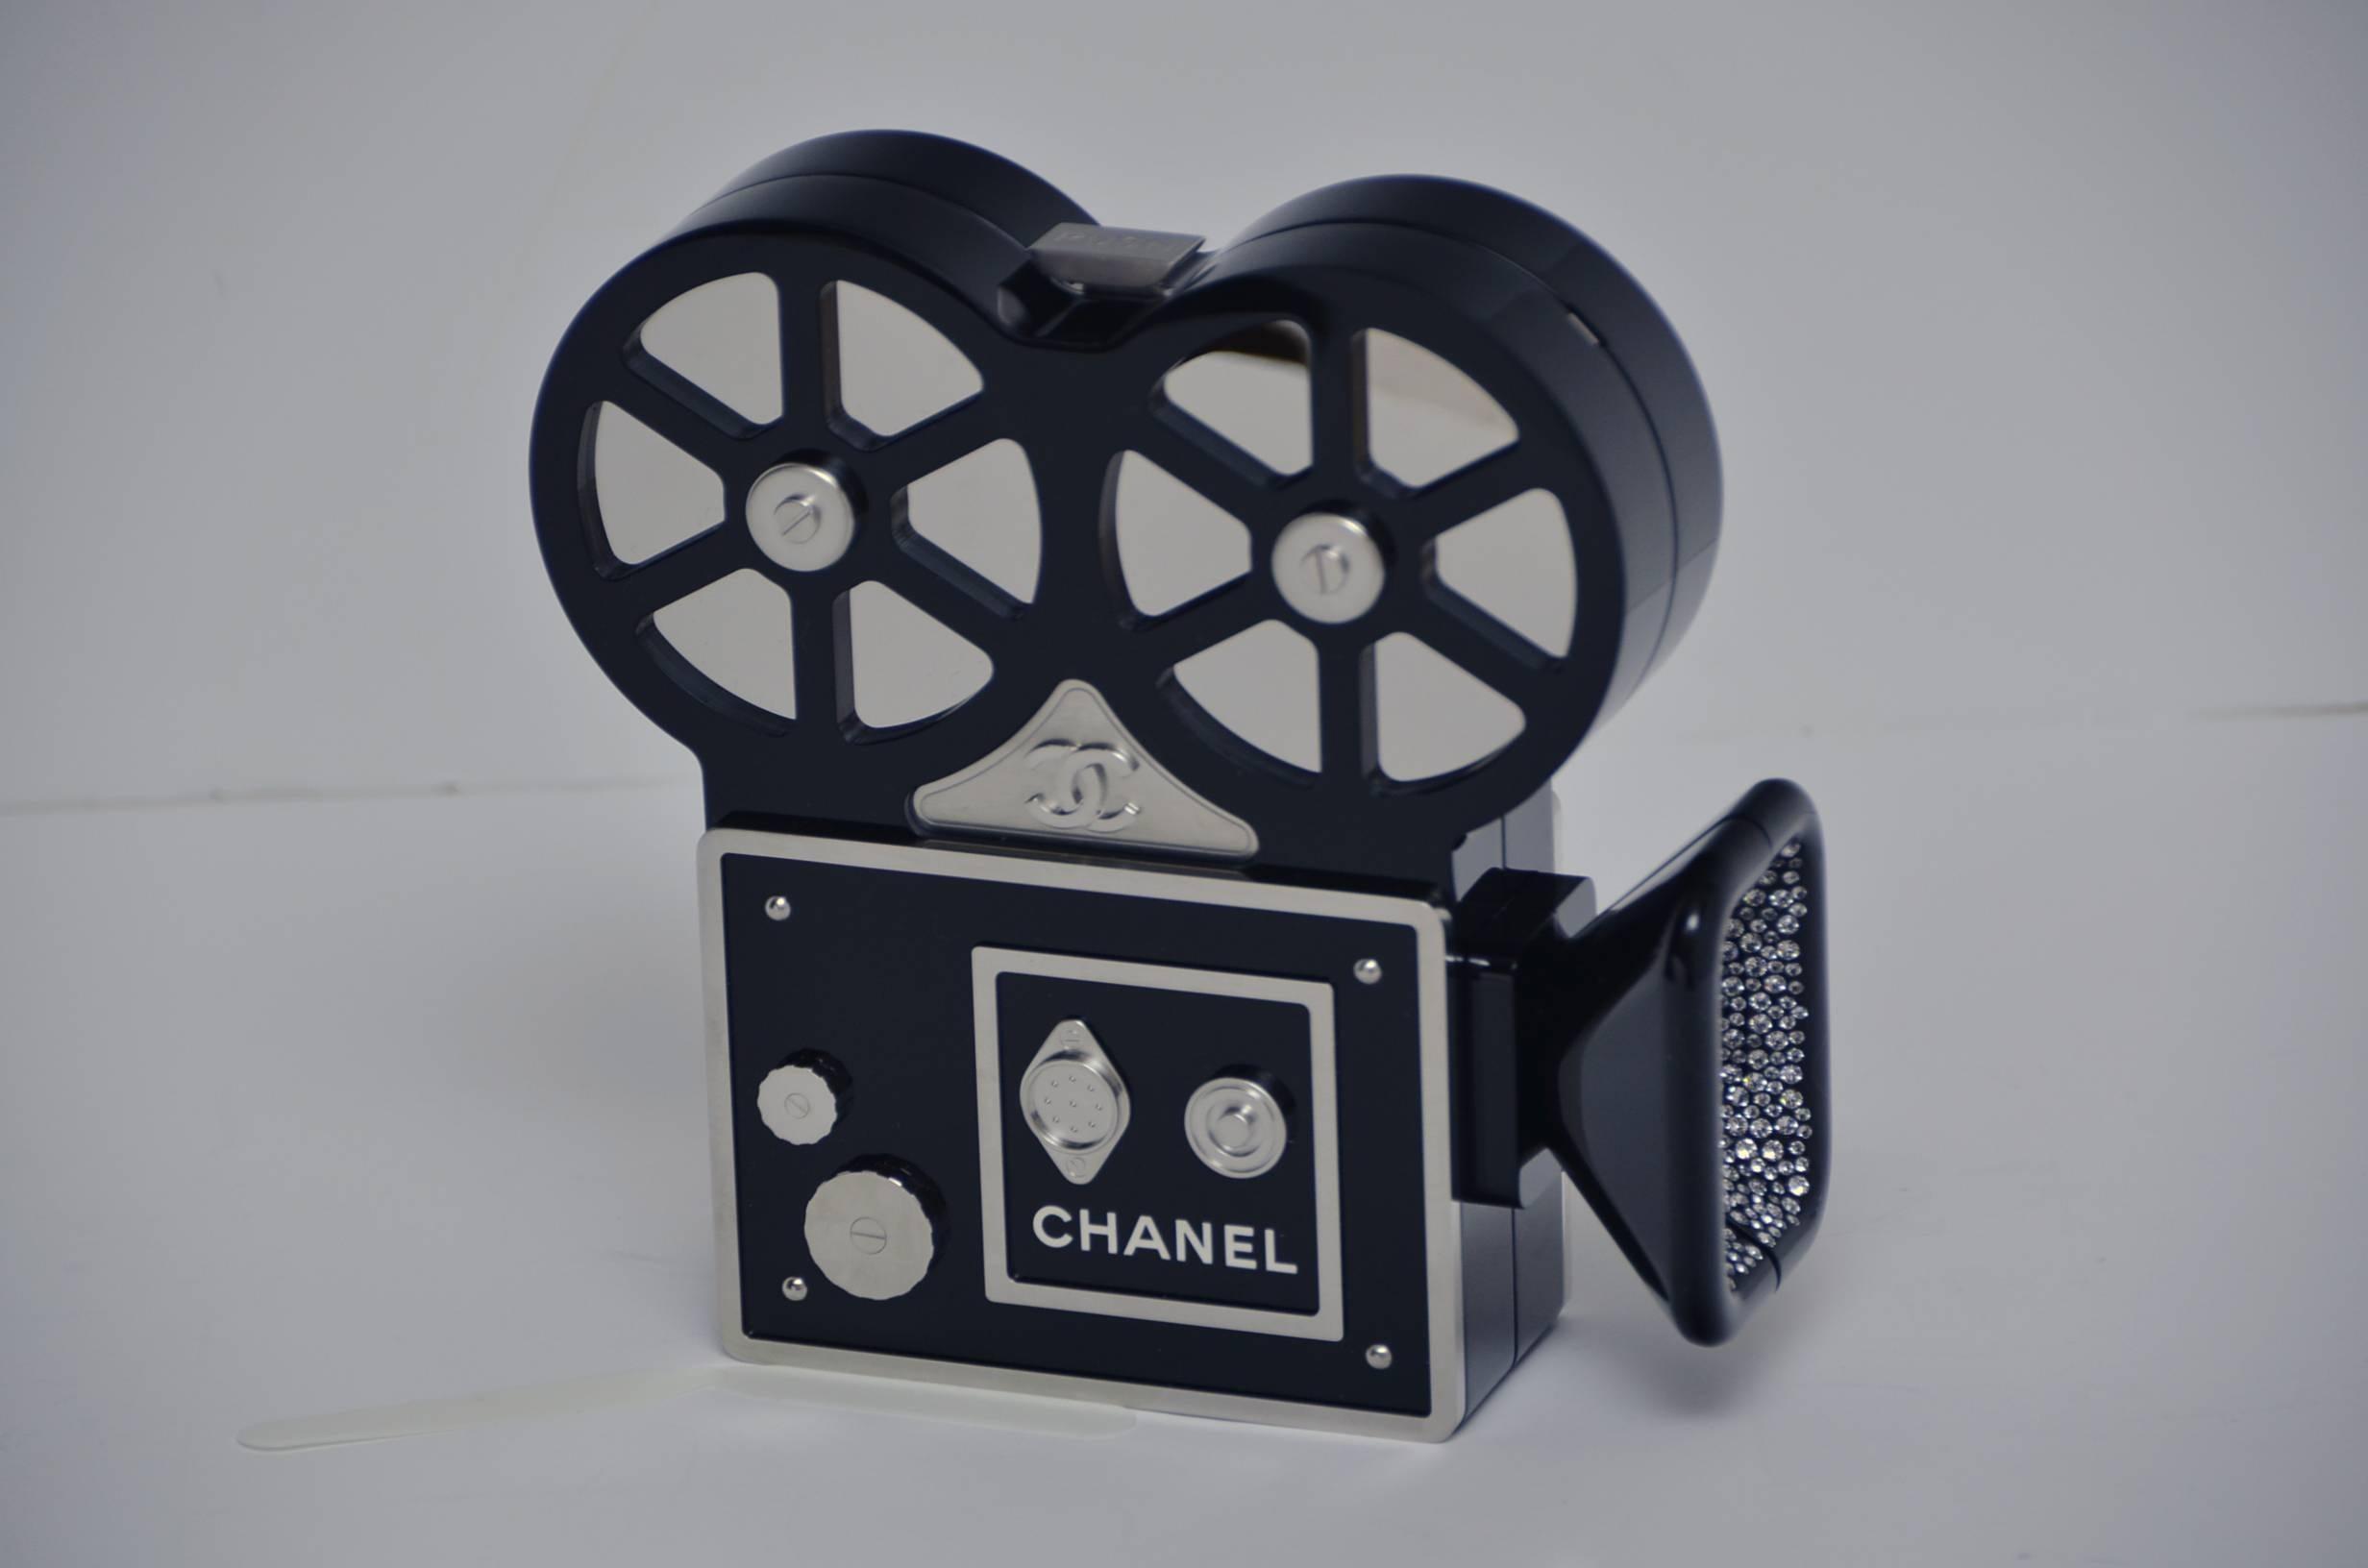 b76e0435cfa0 CHANEL Rome 2016 Movie Camera Minaudière Handbag Limited Edition NEW For  Sale at 1stdibs